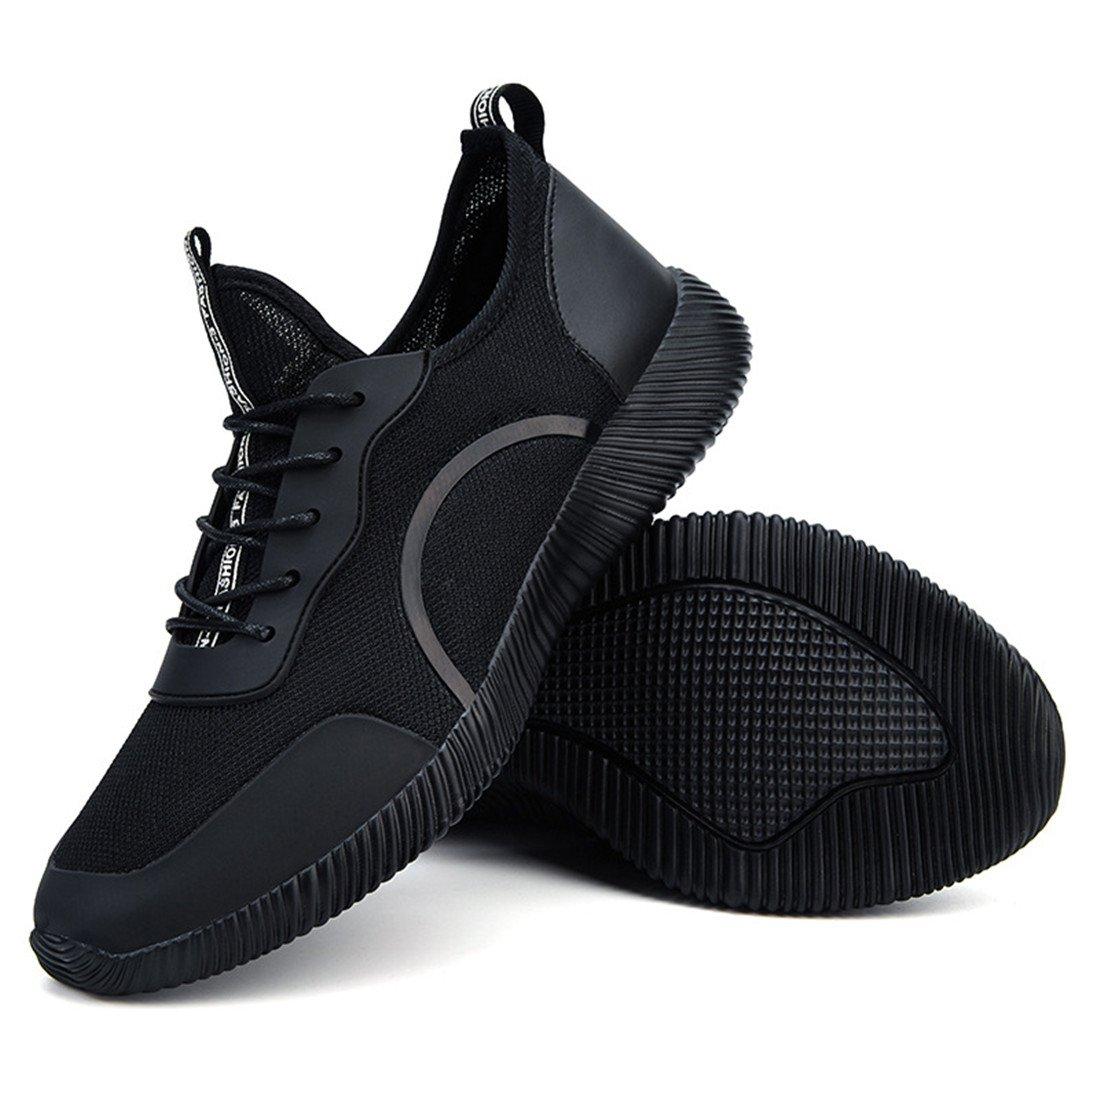 SKY-Maria Herren Mode Laufschuhe Atmungsaktiv Atmungsaktiv Laufschuhe Licht Draussen Sportschuhe Große Größe TRAI 8191c0